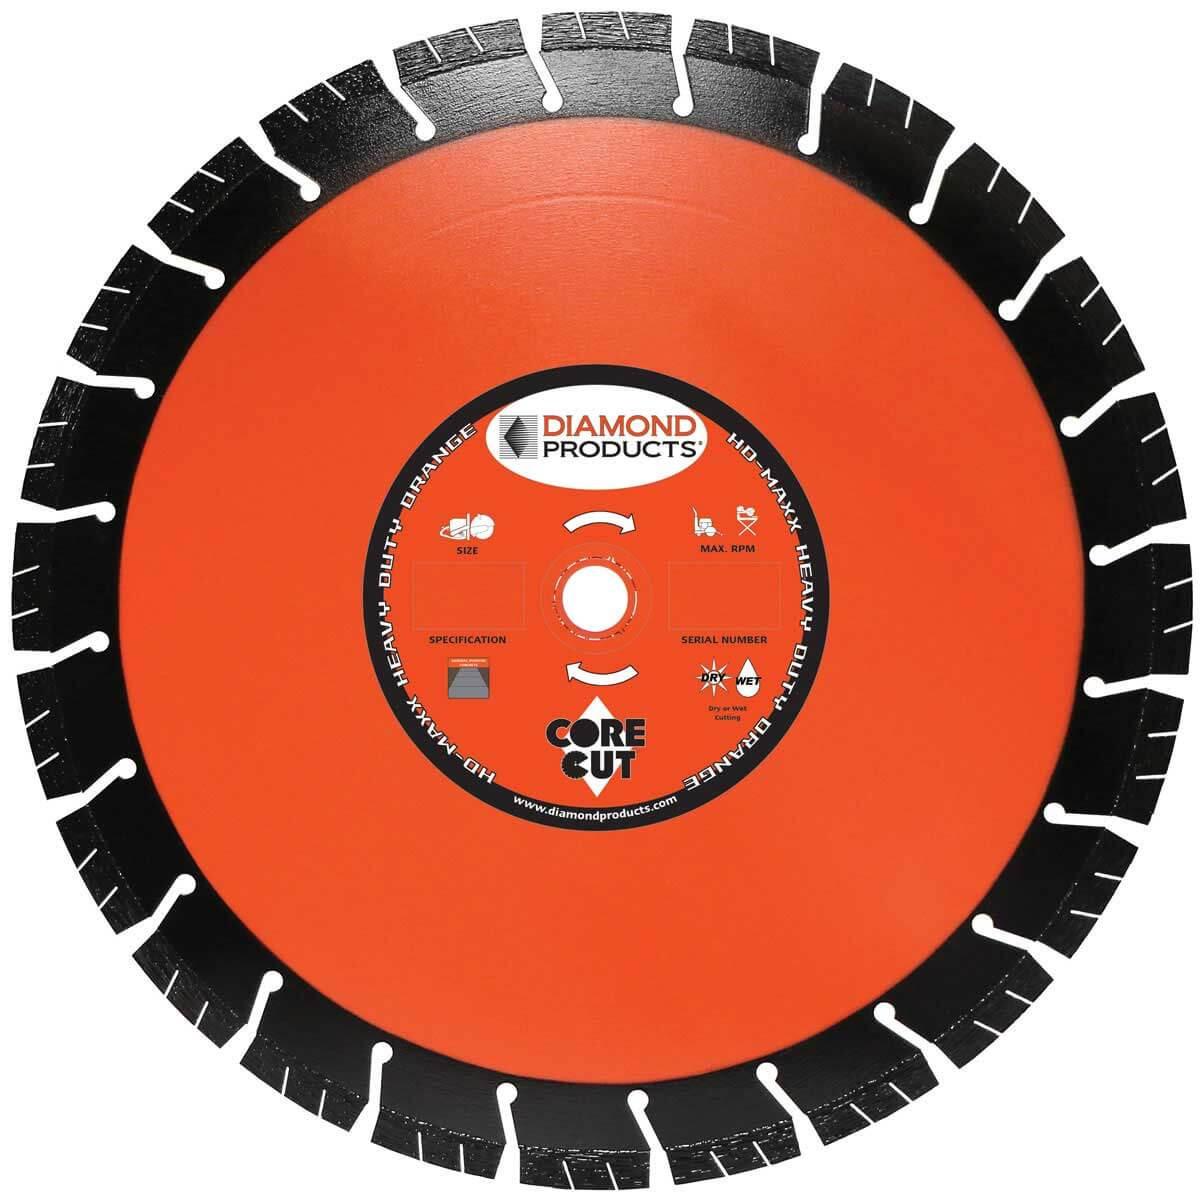 Core Cut Heavy Duty Orange MAXX Diamond Blade